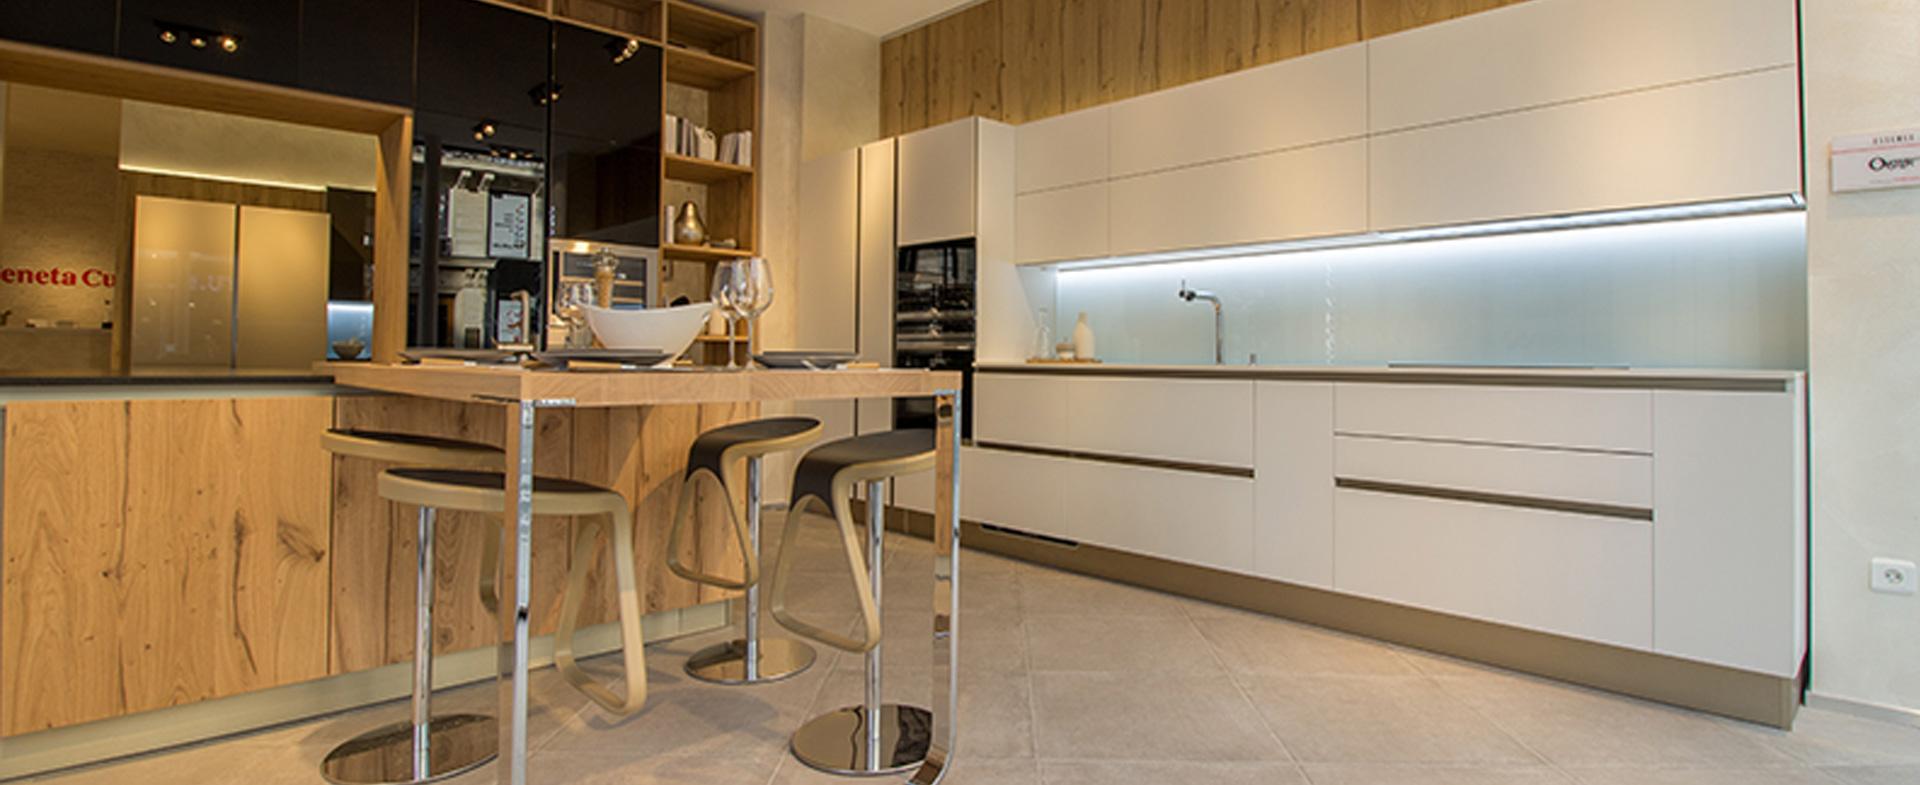 cuisines modernes veneta cucine paris 2 me arrondissement. Black Bedroom Furniture Sets. Home Design Ideas